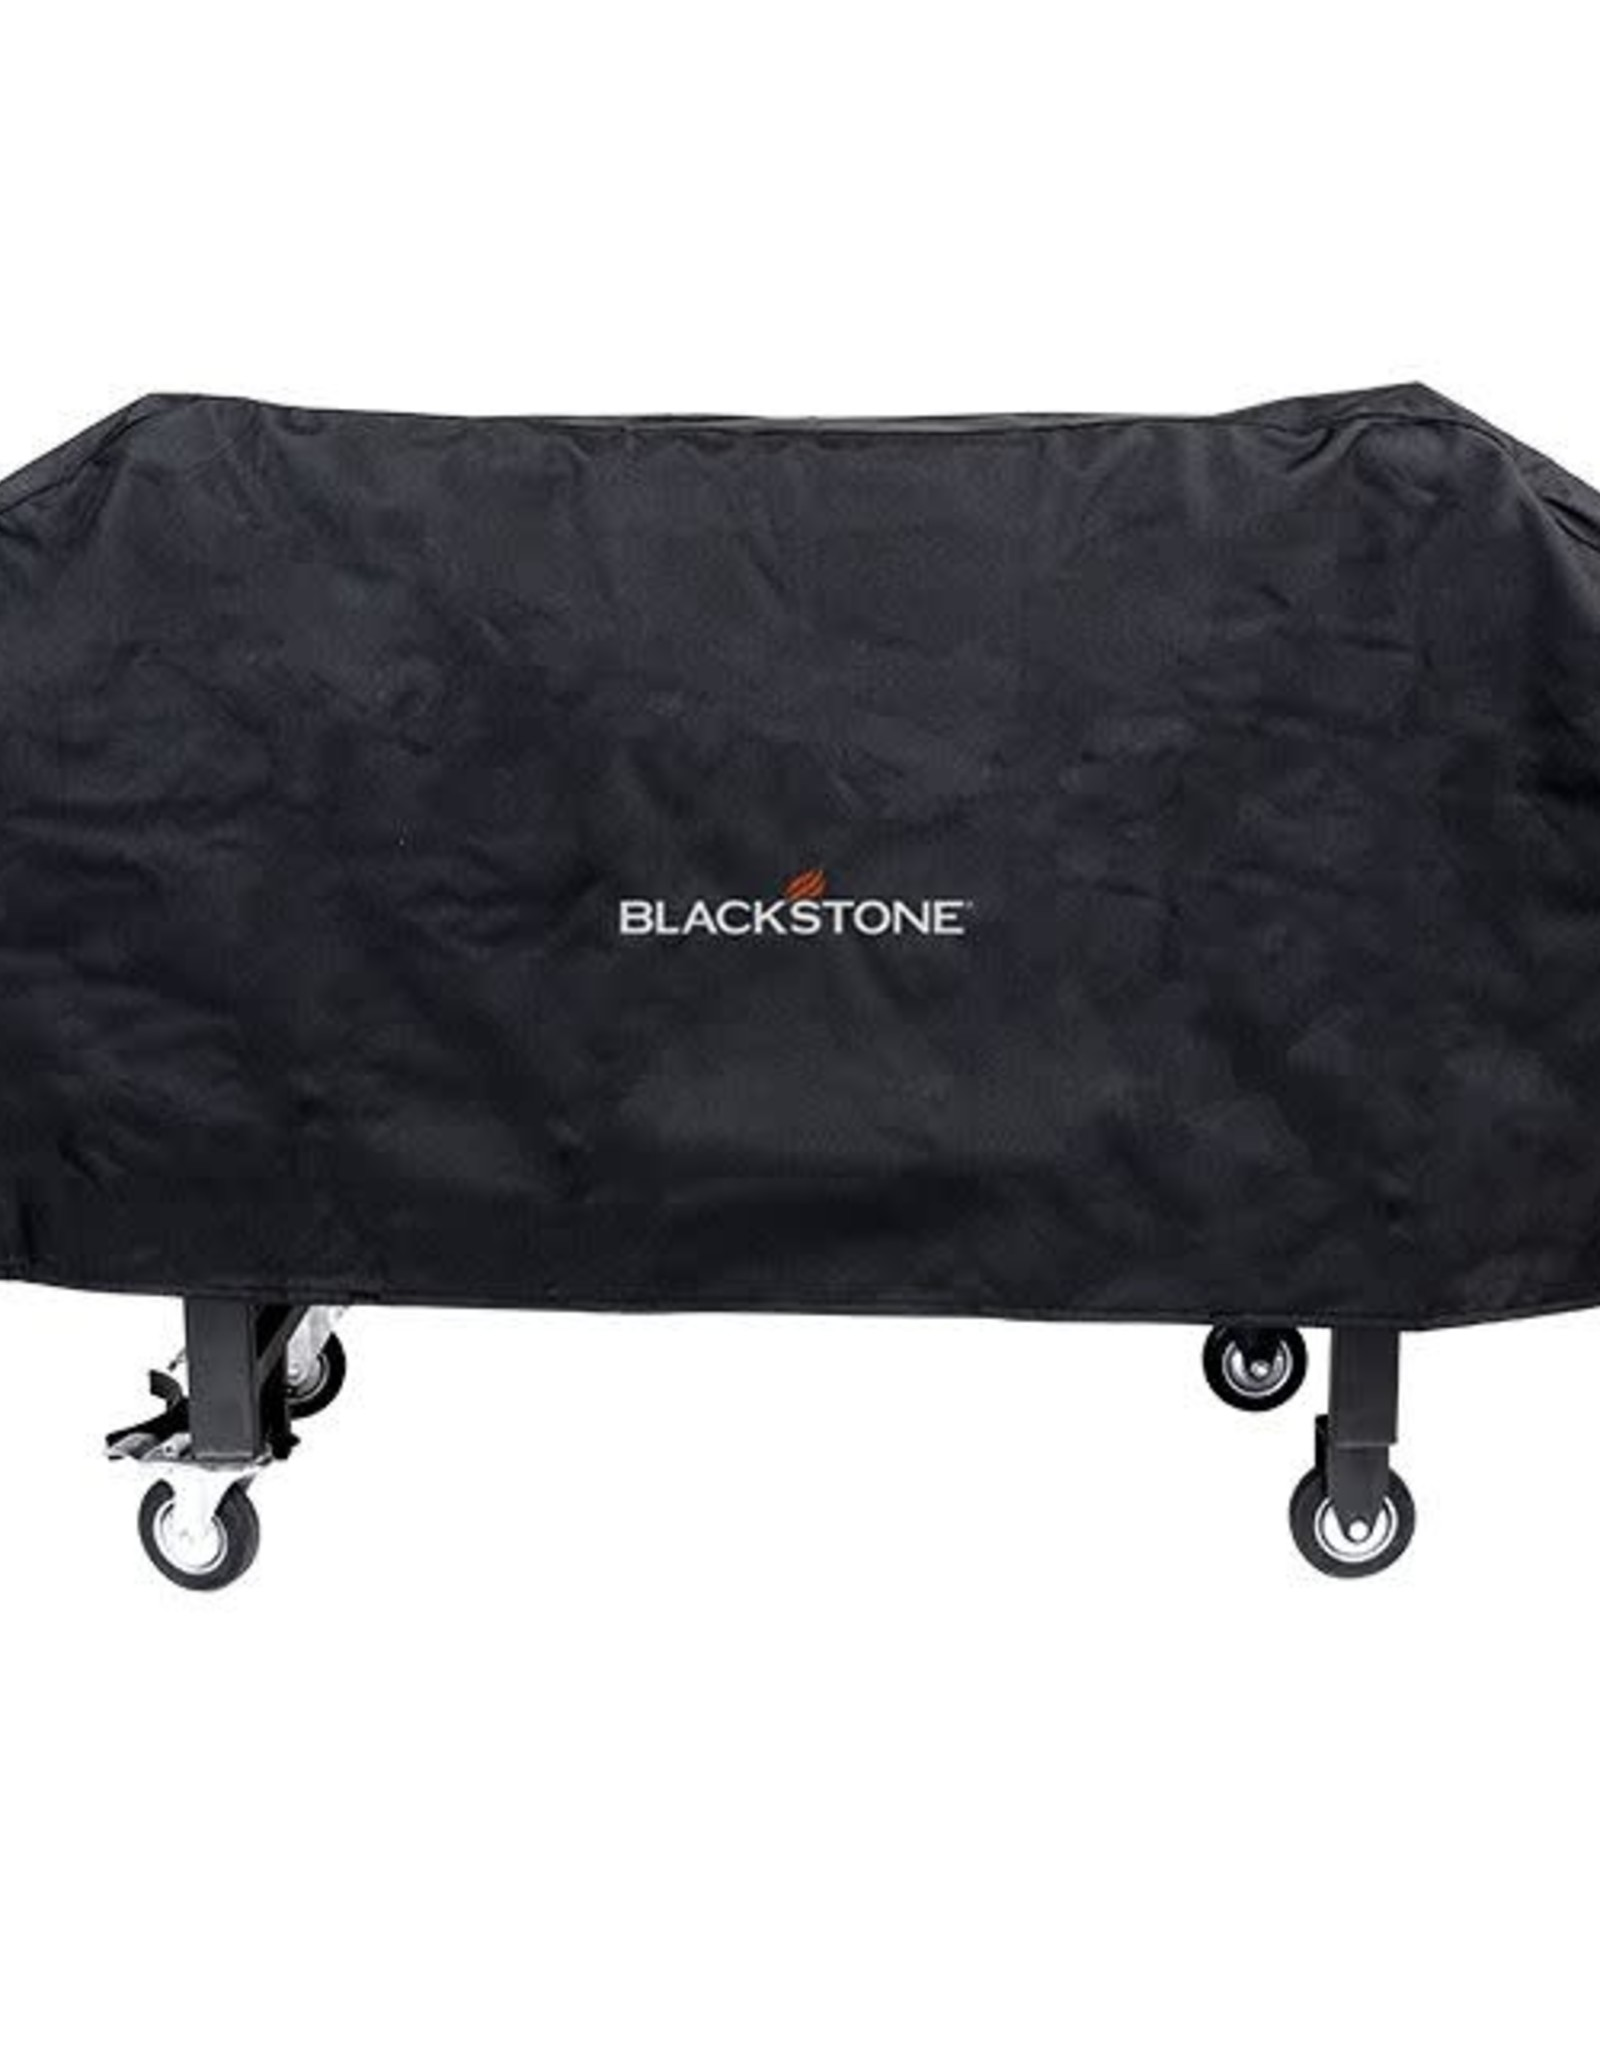 "Blackstone Blackstone 36"" Griddle Soft Cover 1528"